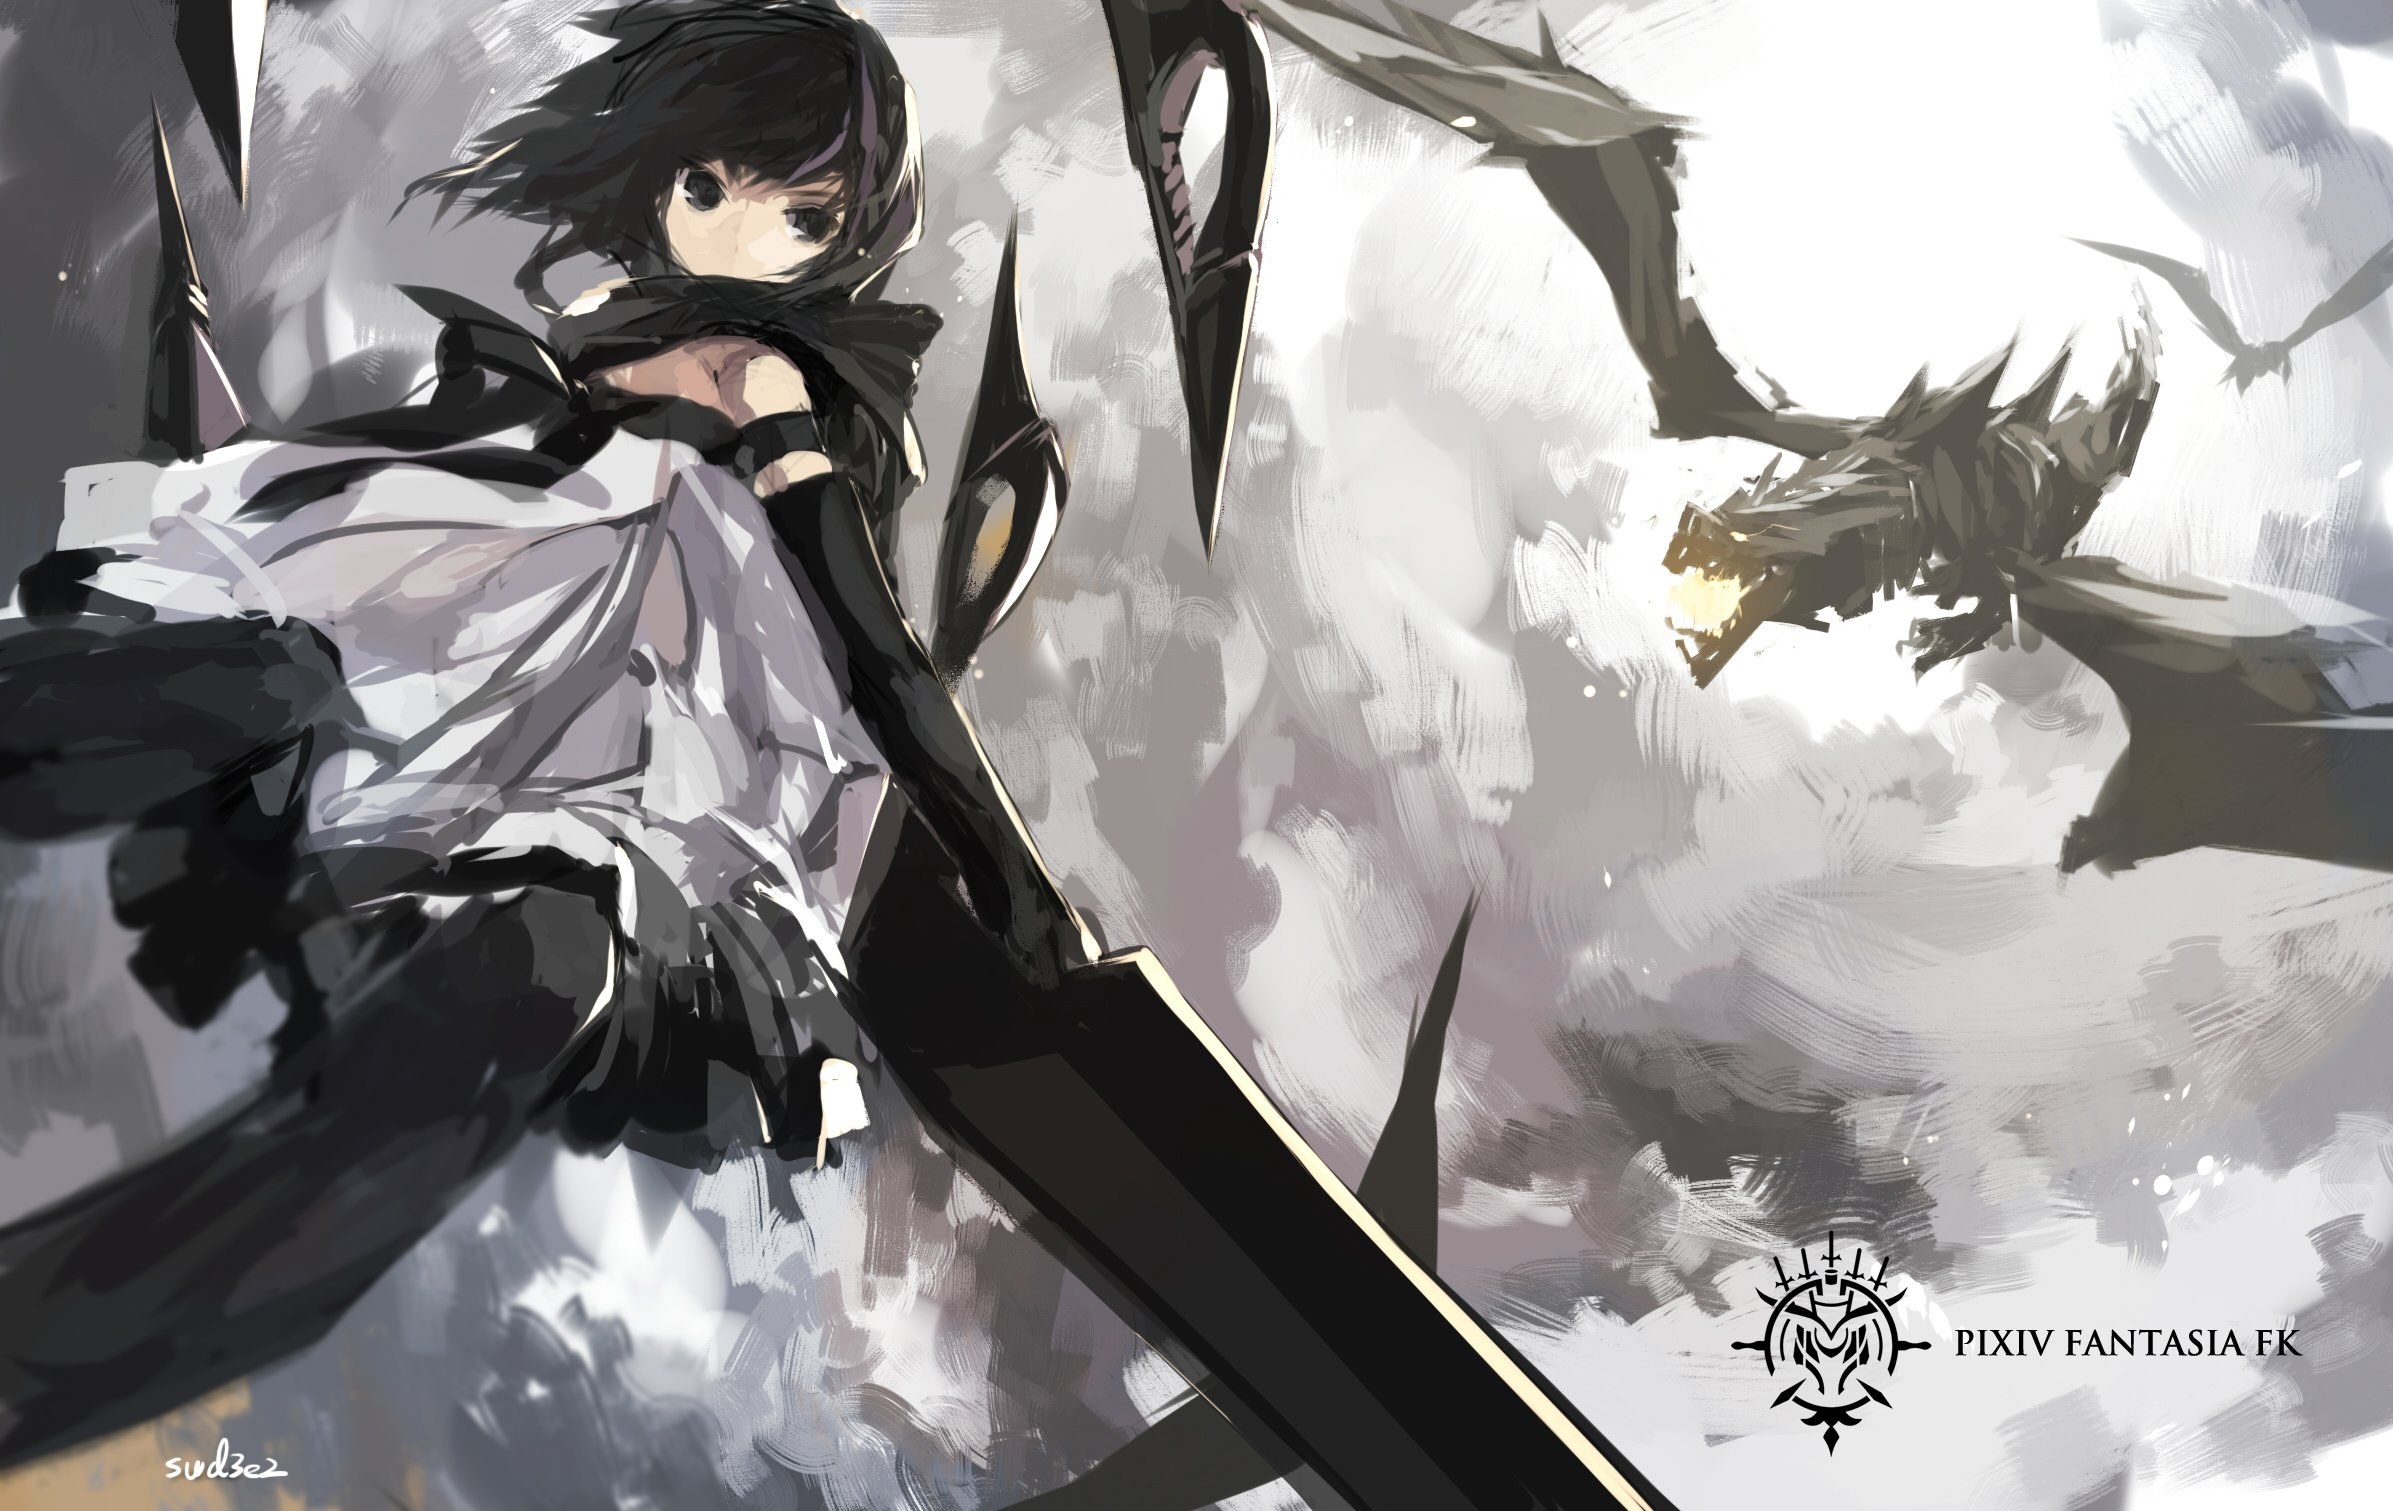 Touhou Fall Wallpaper Black Eyes Brown Hair Dragon Dress Elbow Gloves Pixiv